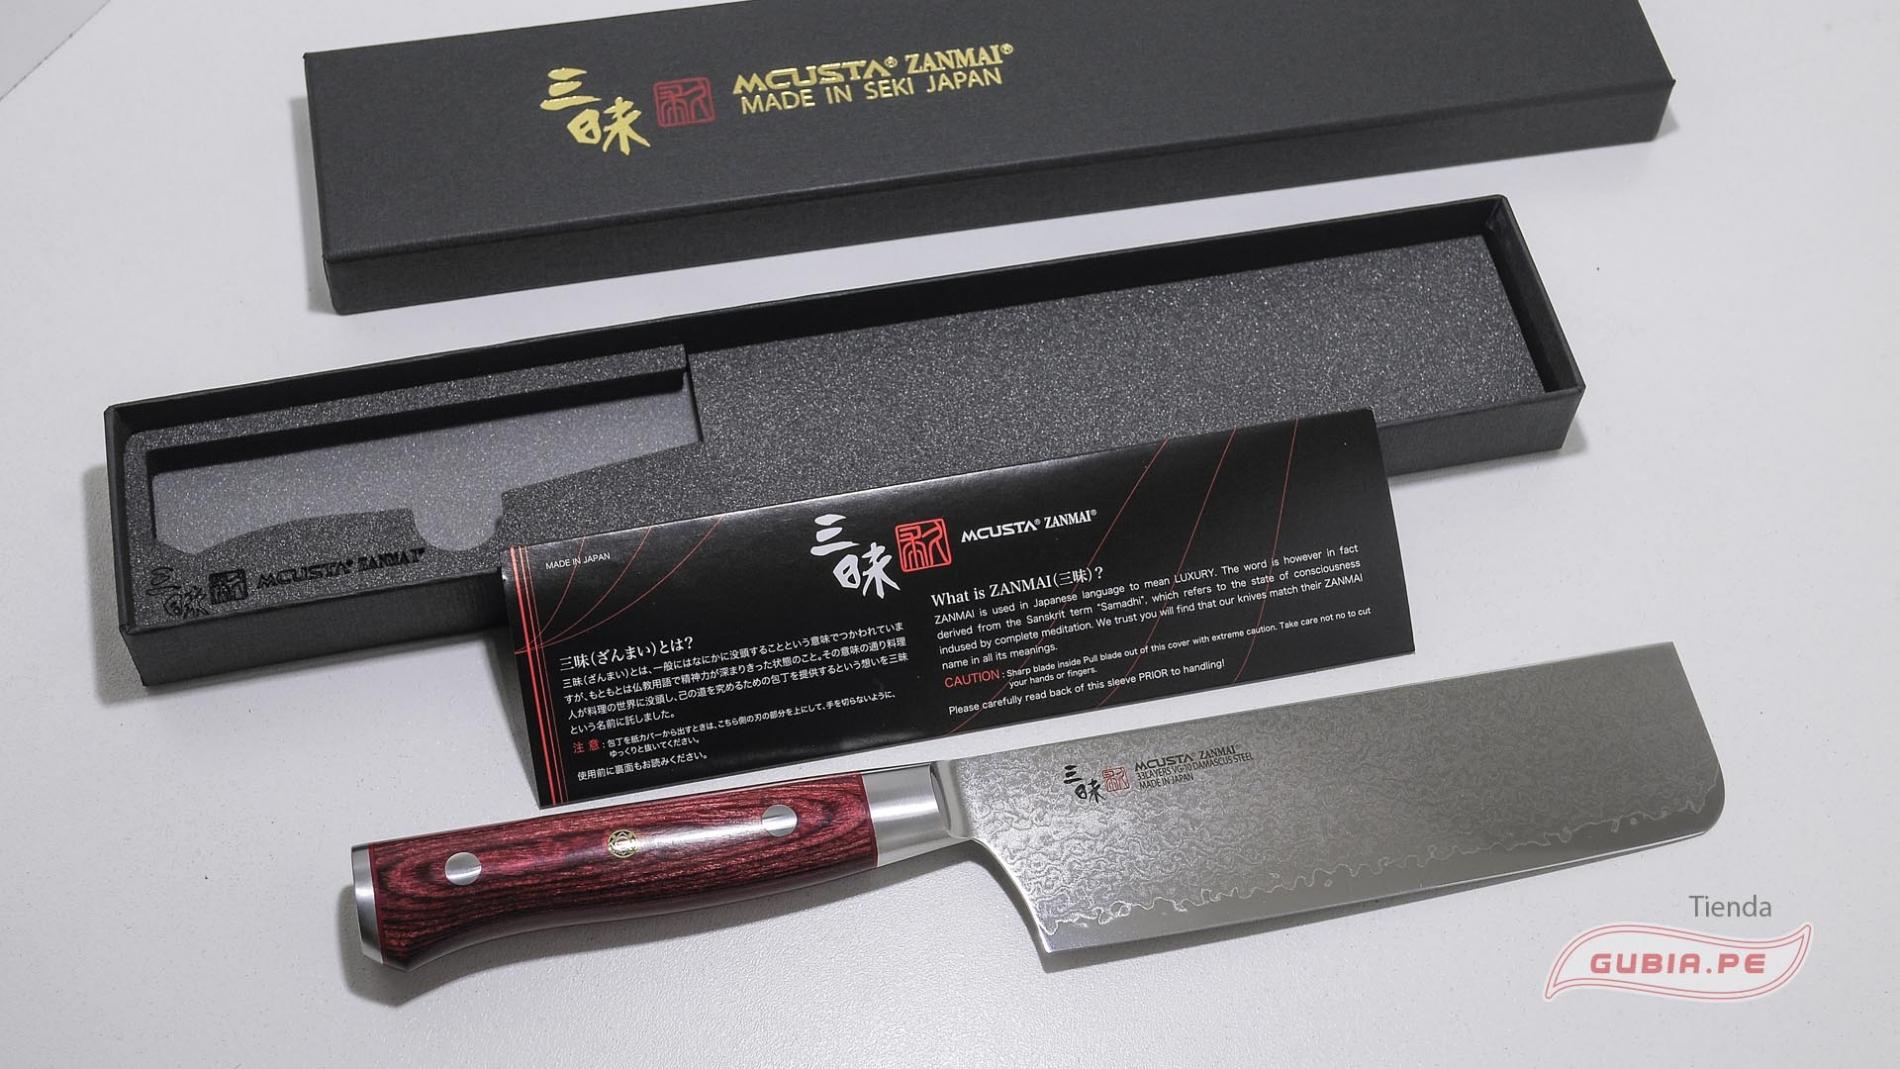 HFR-8008D-Cuchillo Nakiri 16.5cm acero VG10 Classic Pro Damascus Zanmai HFR-8008D-max-8.